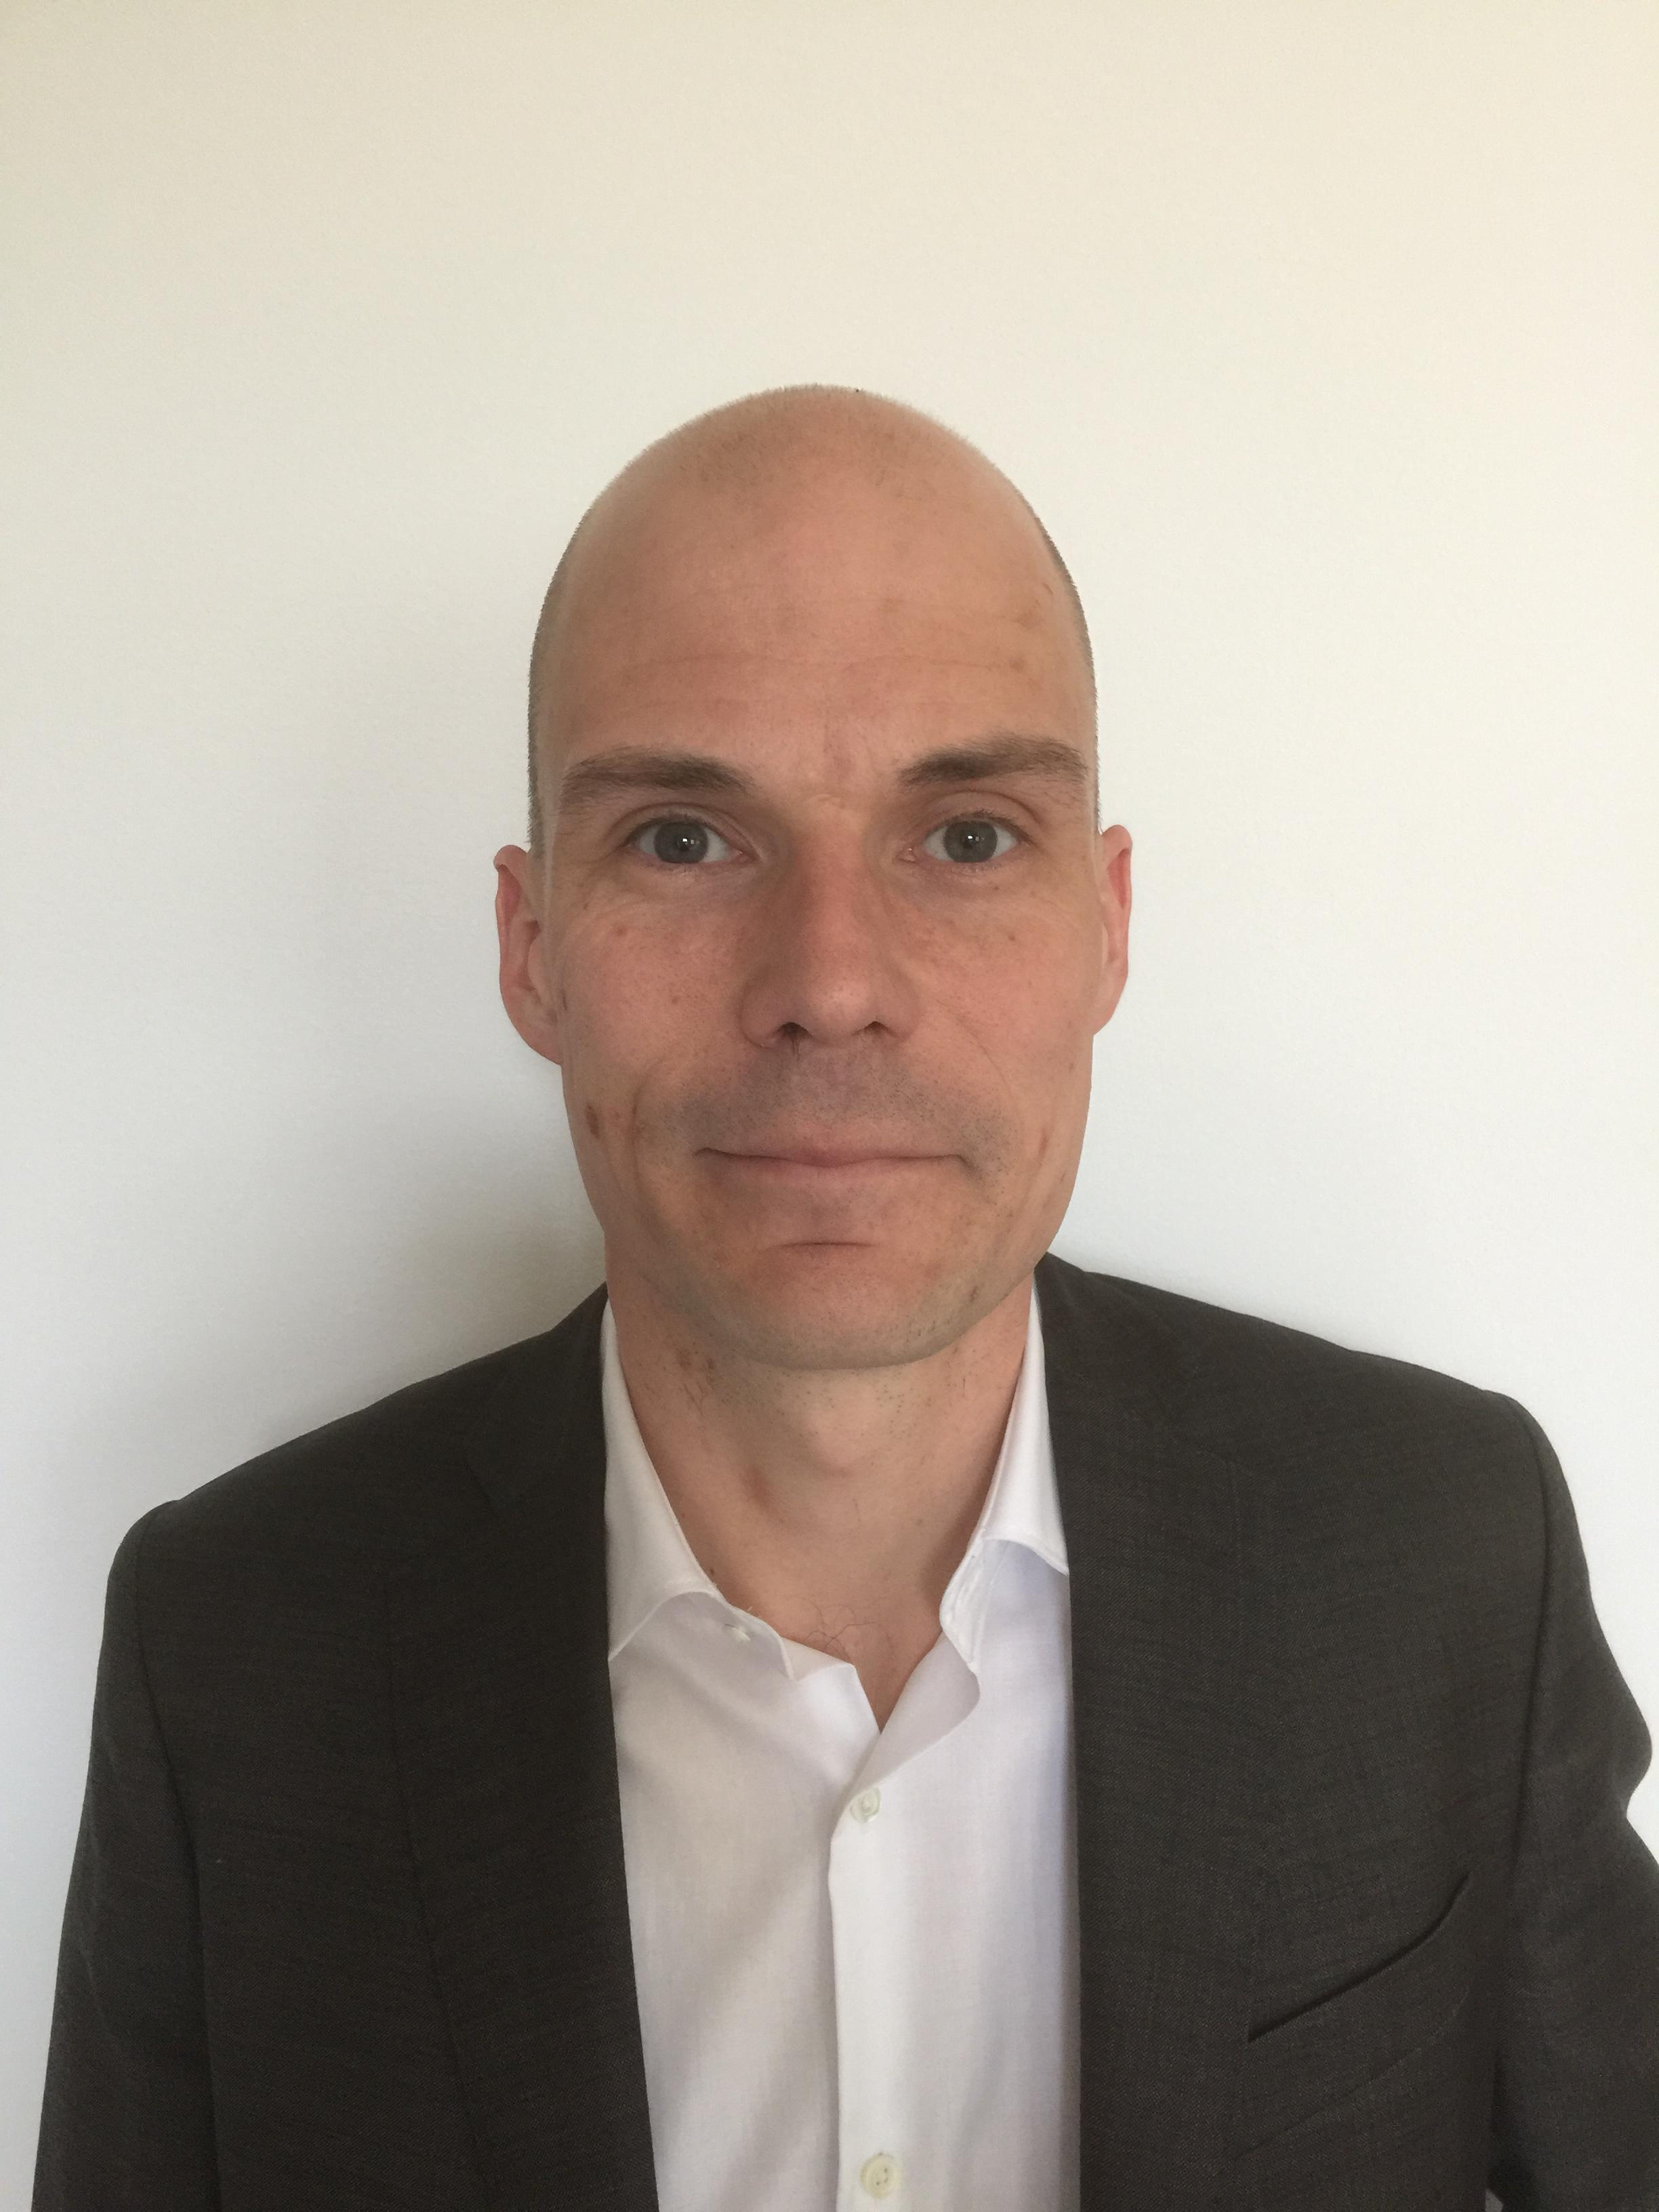 Jonathan Borggren